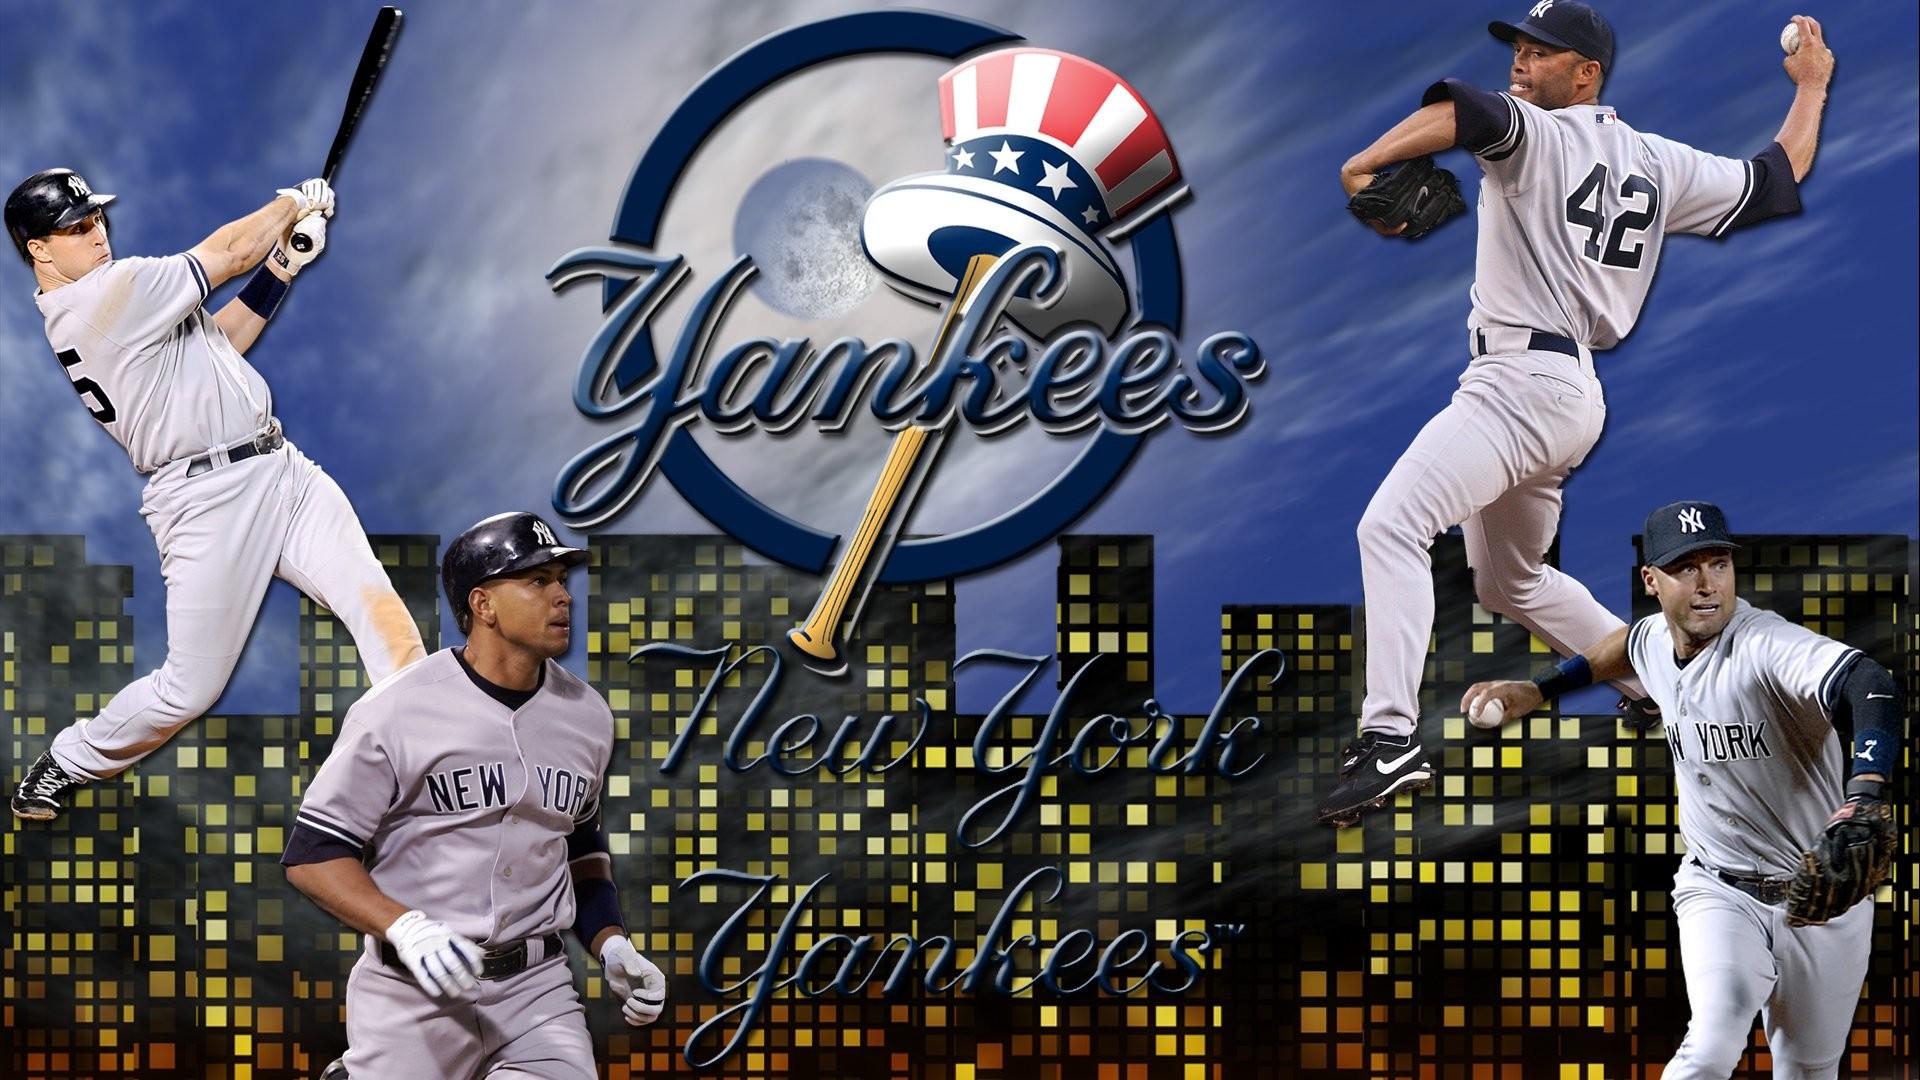 HD Wallpaper   Background ID:293745. Sports New York Yankees